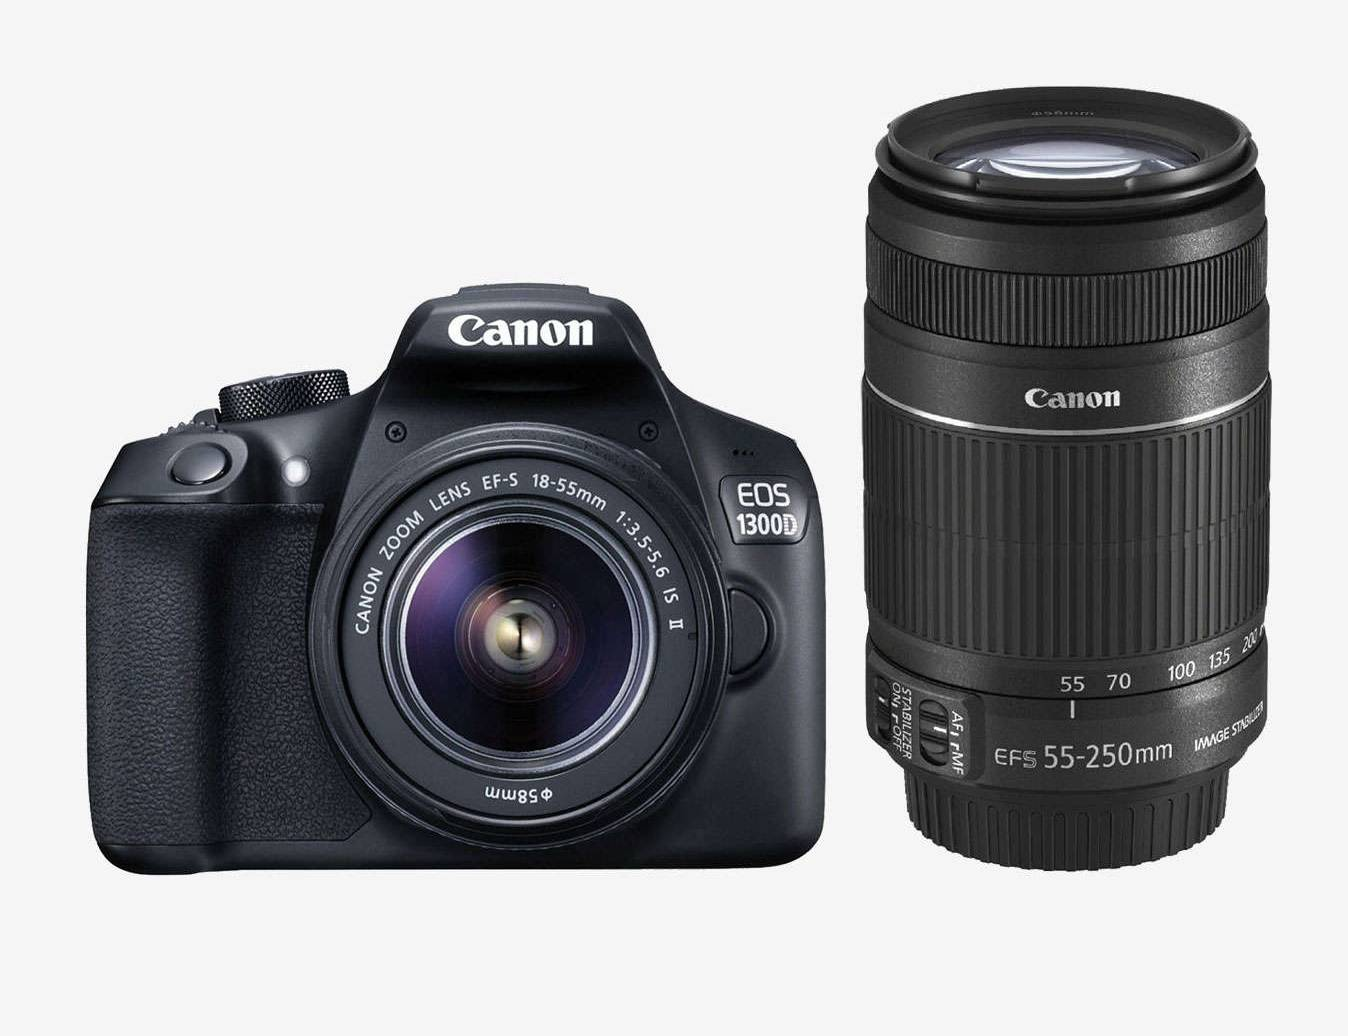 Canon EOS 1300D (EF S18-55 IS II & 55-250 Lens) DSLR Camera